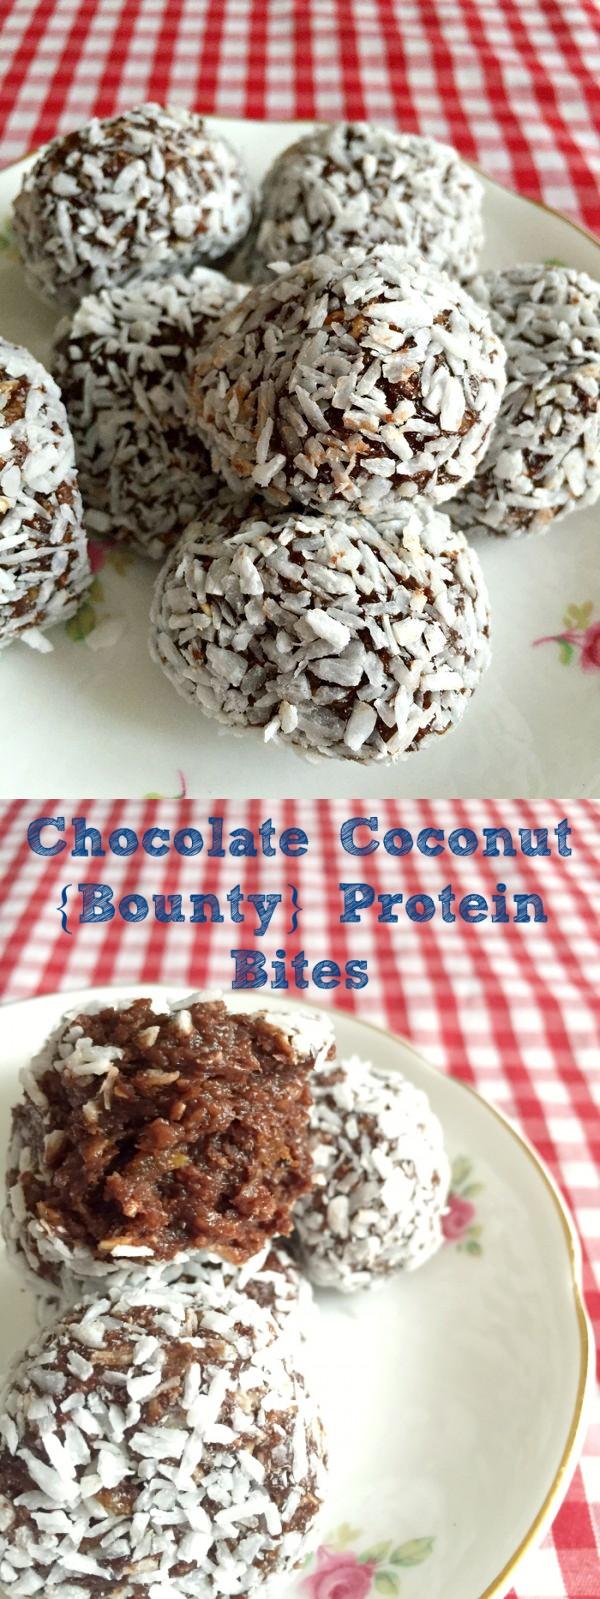 Chocolate Coconut (Bounty Protein Bites